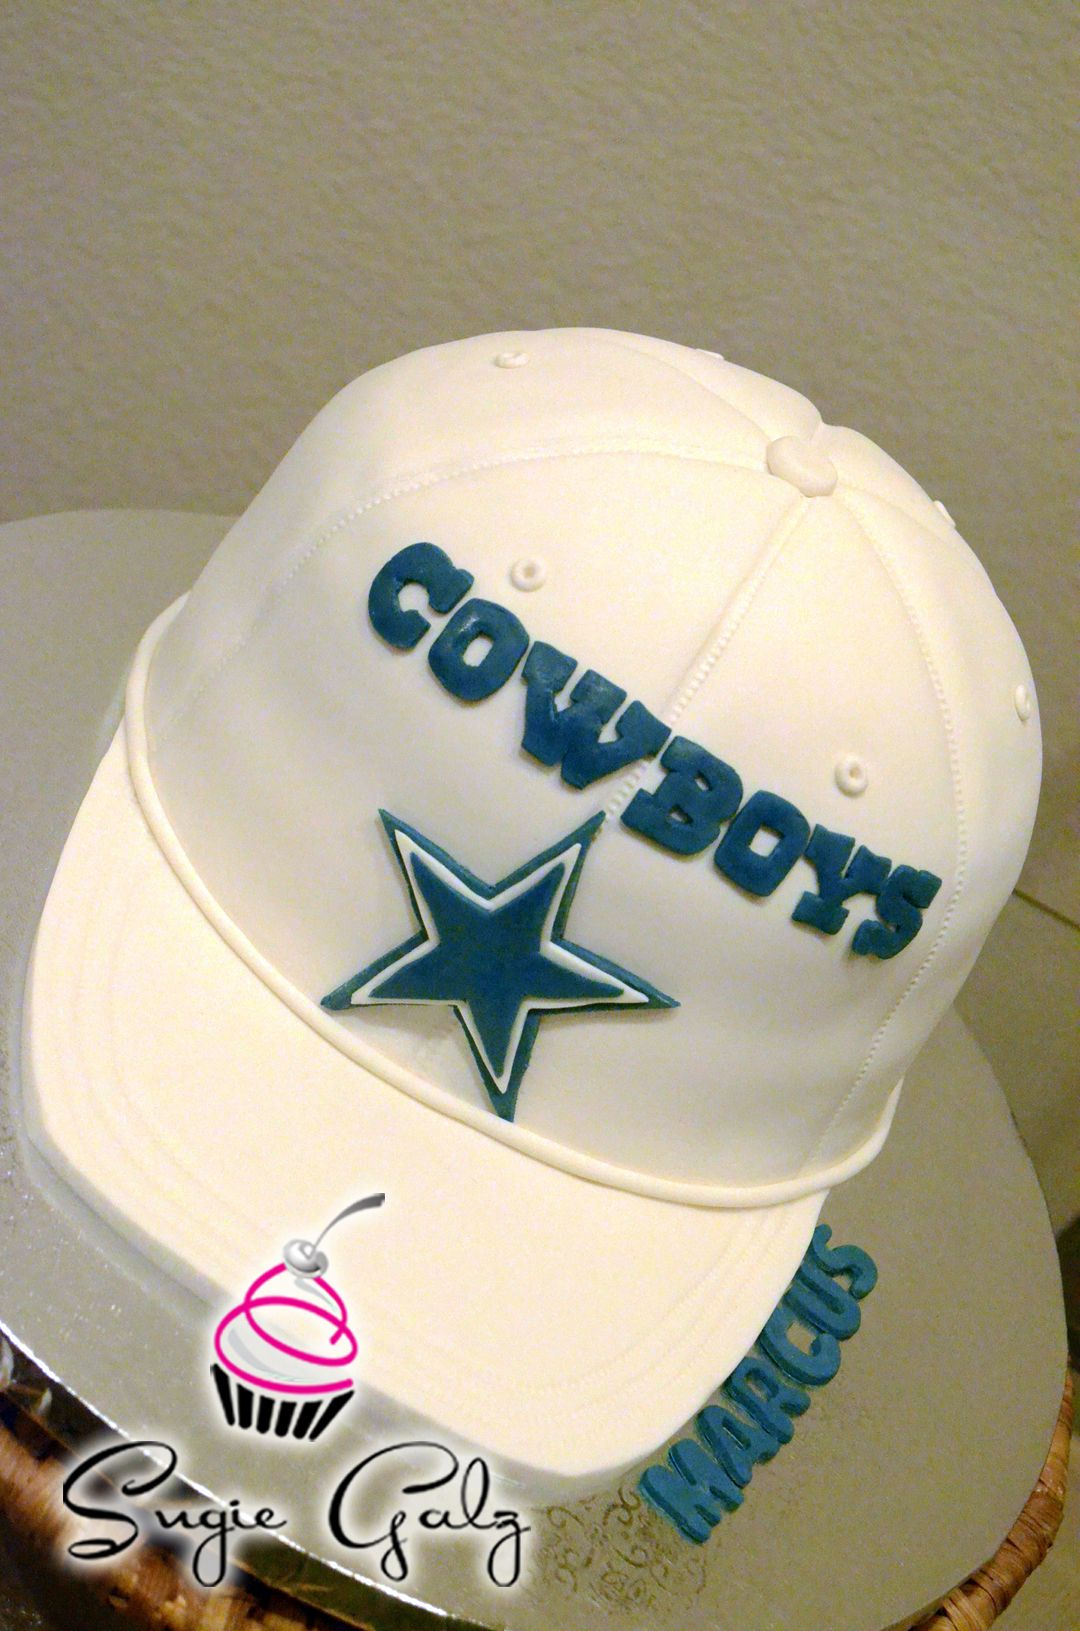 Stupendous Dallas Cowboys Hat Birthday Cake By Sugie Galz In Austin Texas Funny Birthday Cards Online Alyptdamsfinfo